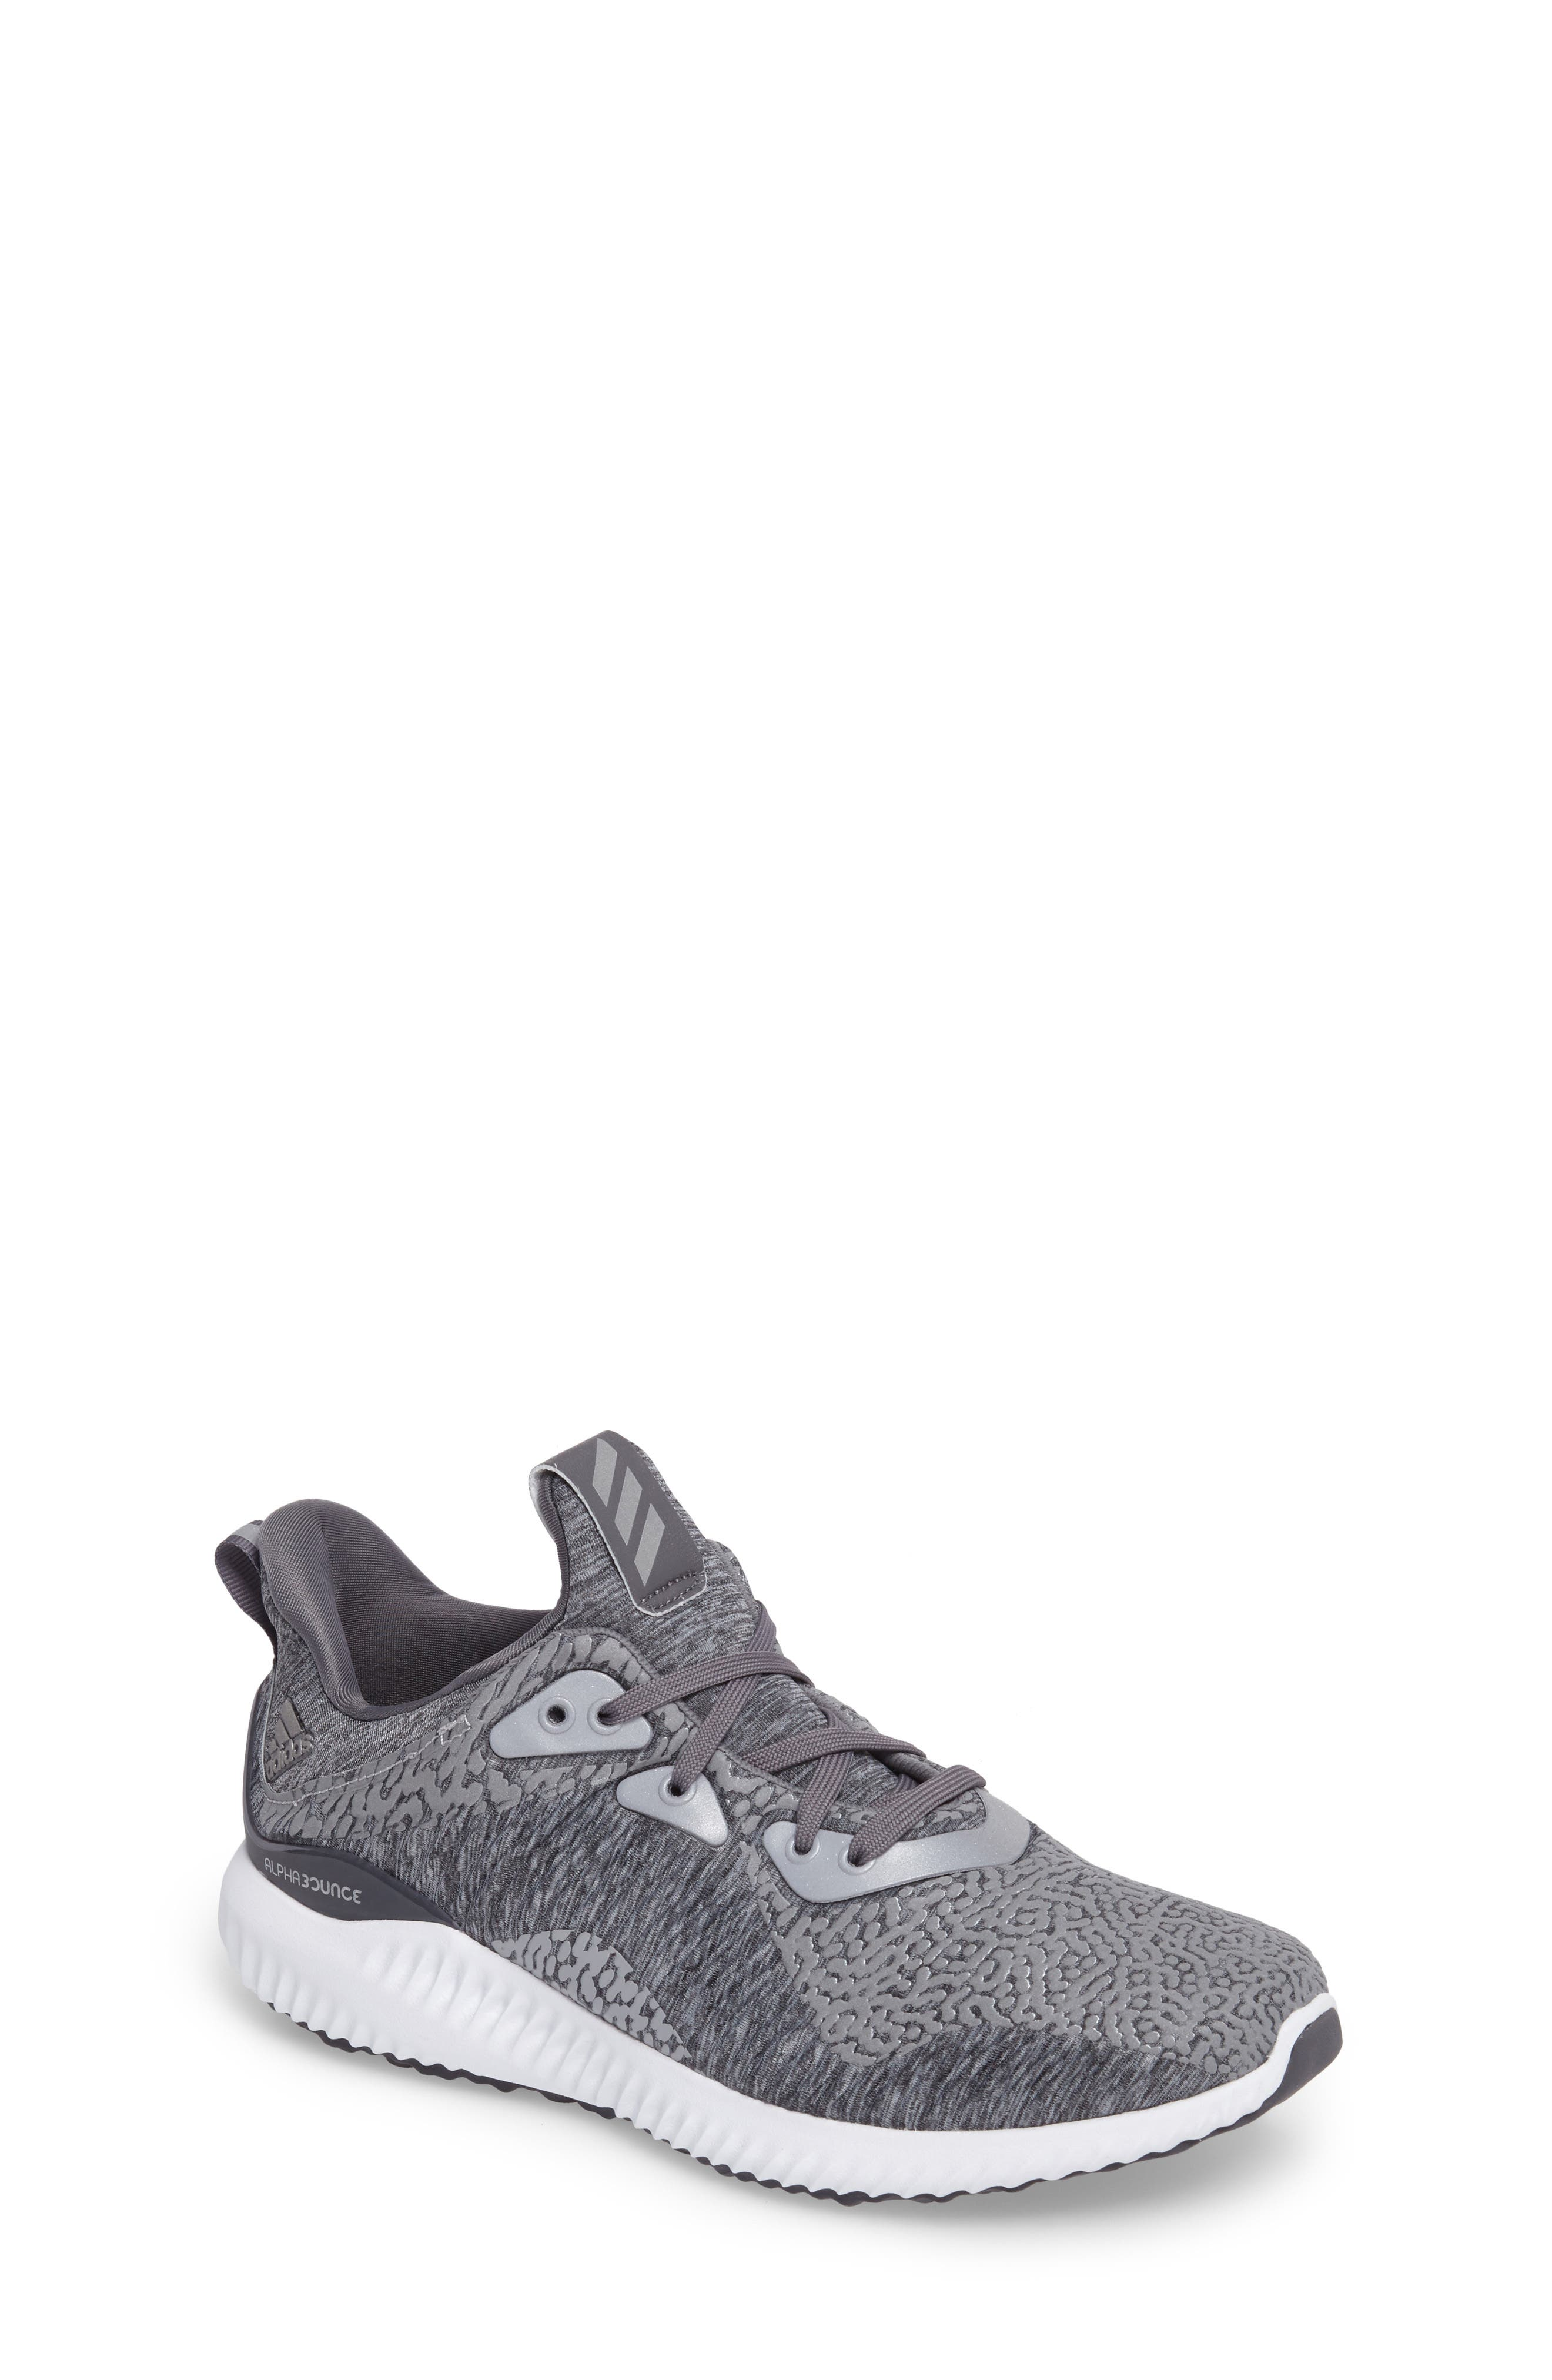 AlphaBounce Sneaker,                             Main thumbnail 1, color,                             035